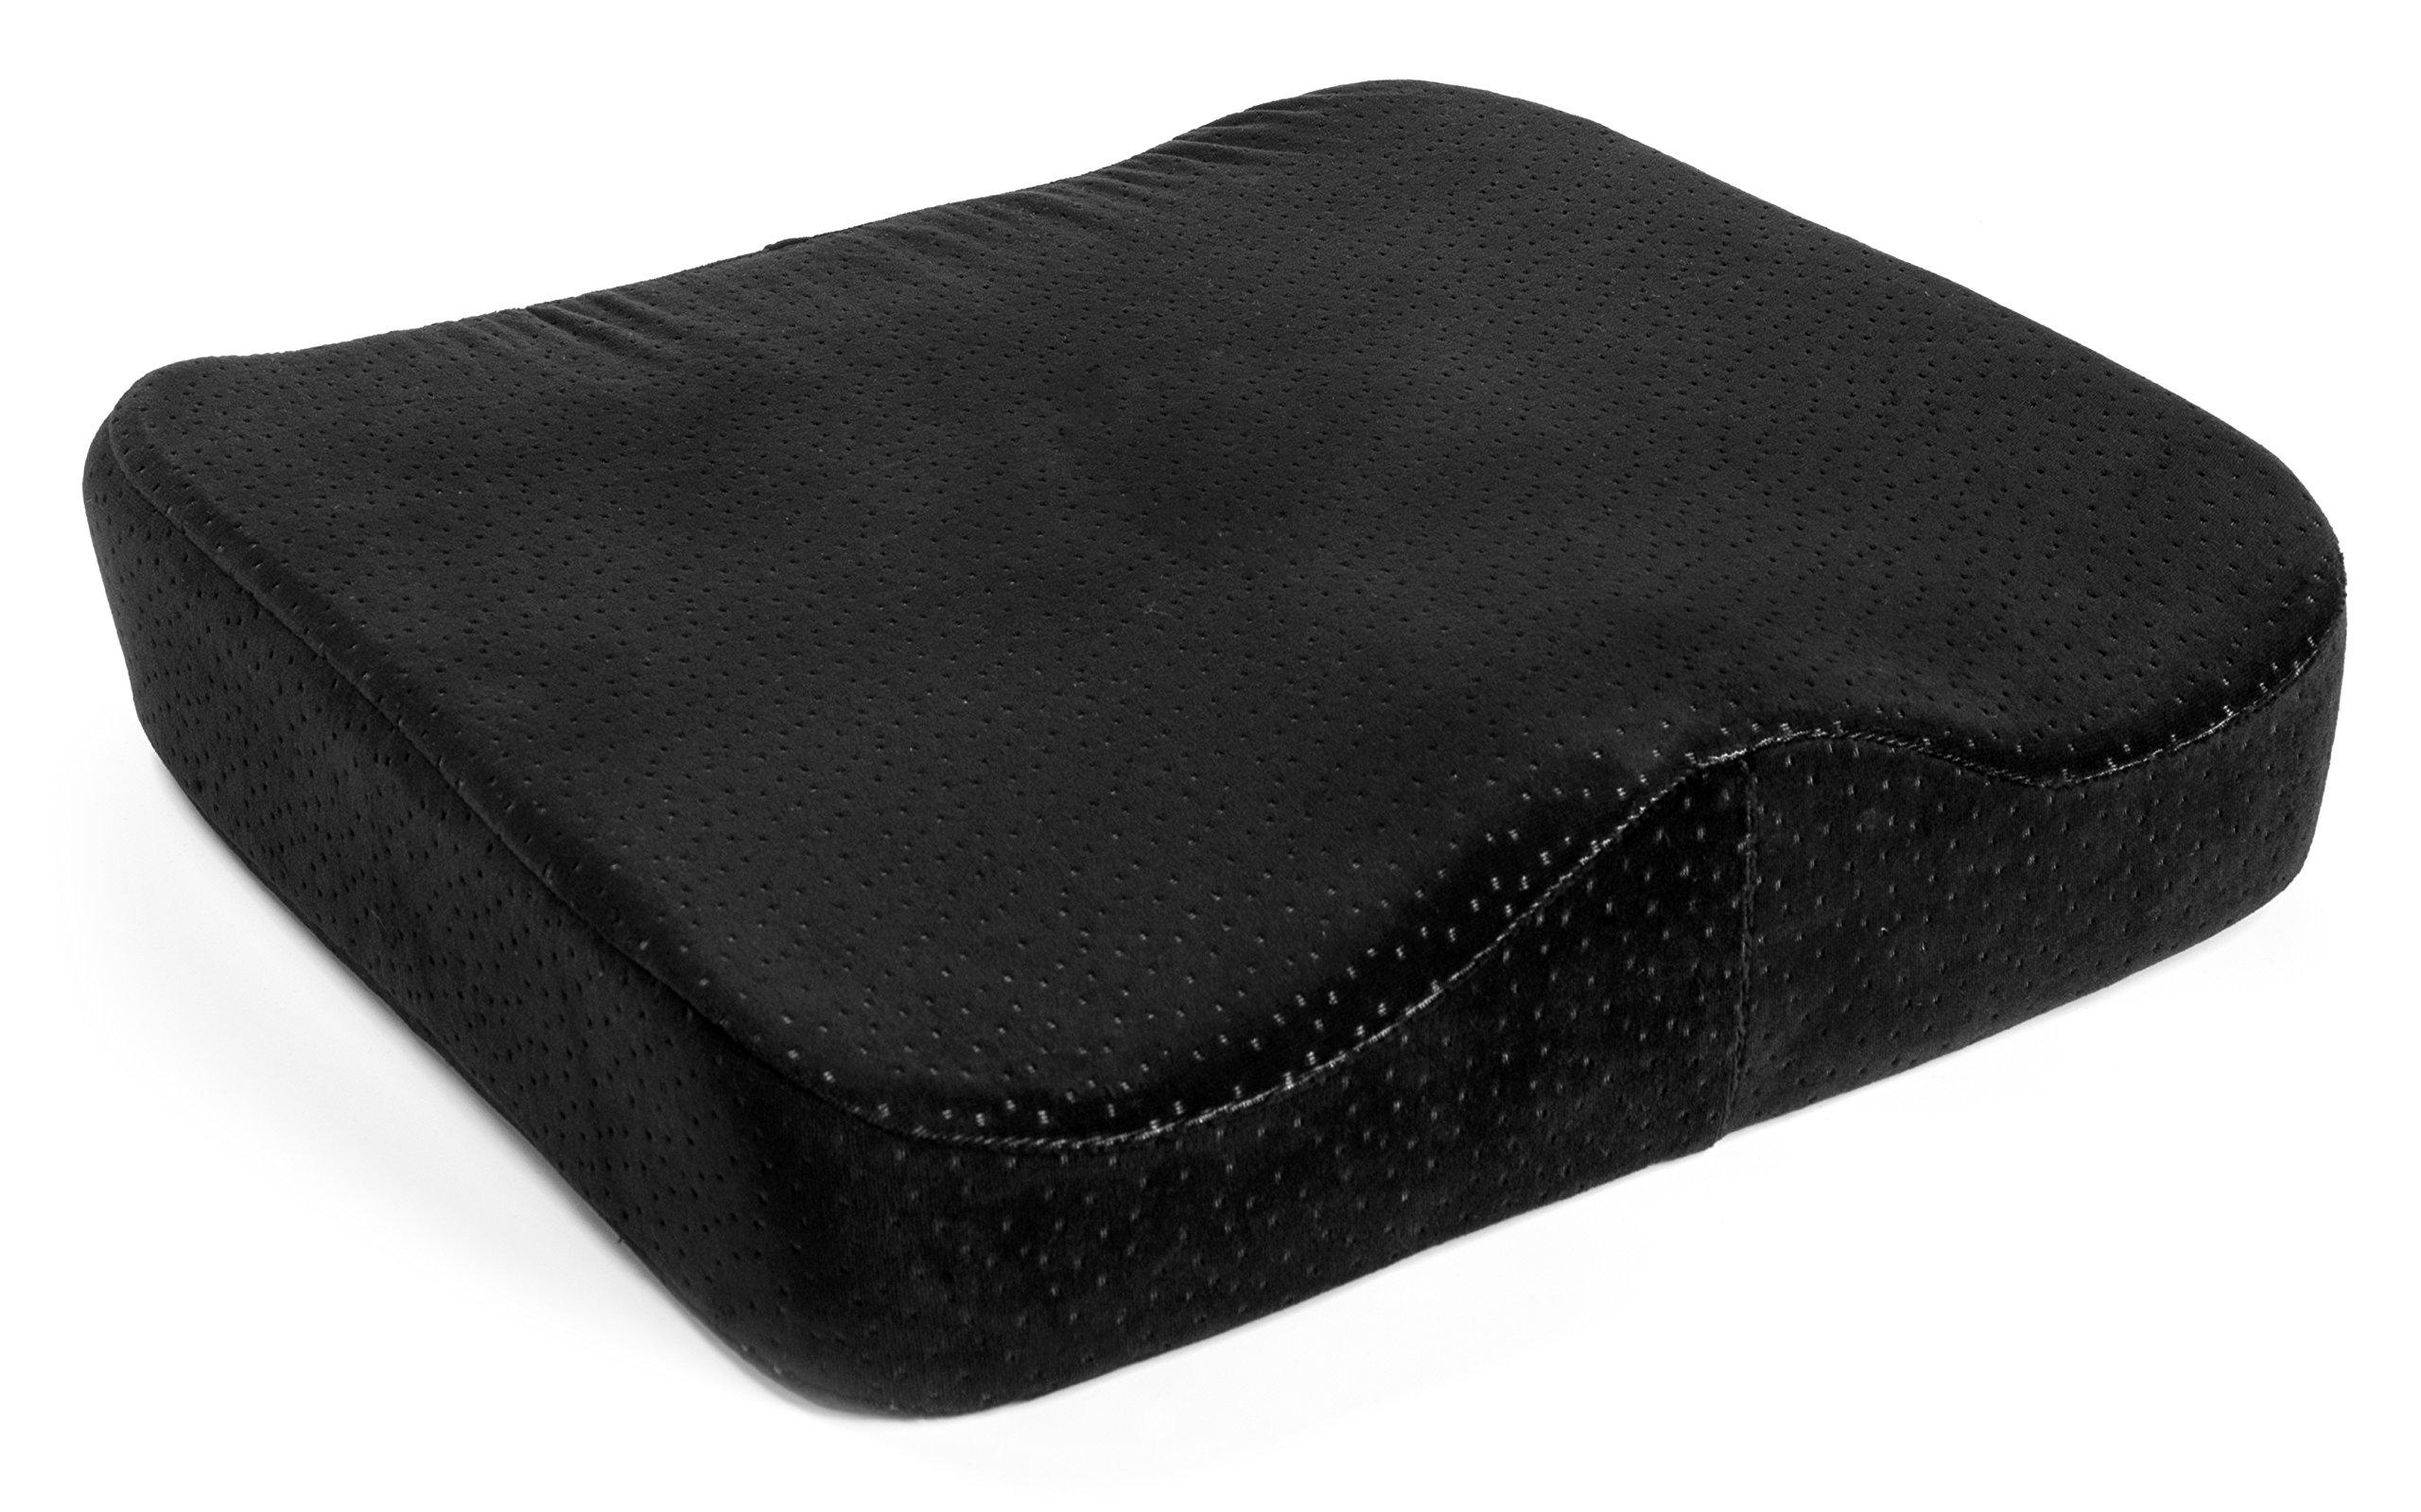 Aeris Memory Foam Premium Large Office Chair Pad - Car Seat Cushion with Machine Washable Black Plush Velour Cover by AERIS